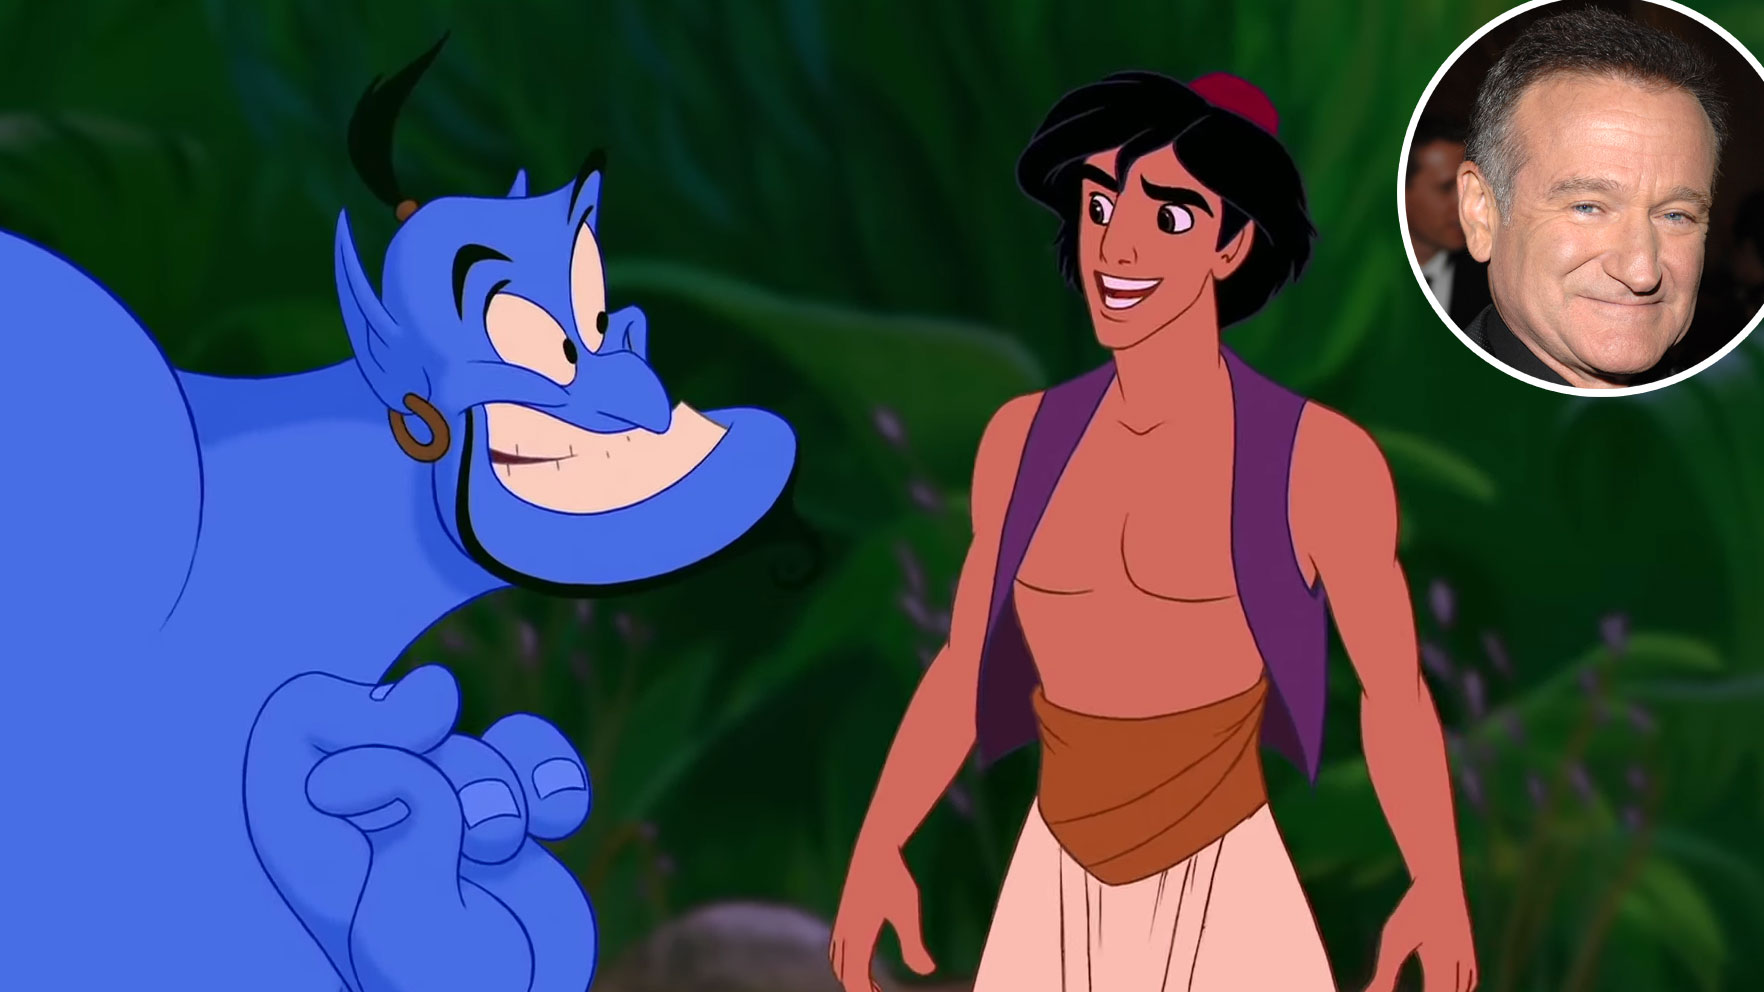 Robin Williams Genie Aladdin Voice Over Disney and Pixar Characters - The Genie in Aladdin (1992)